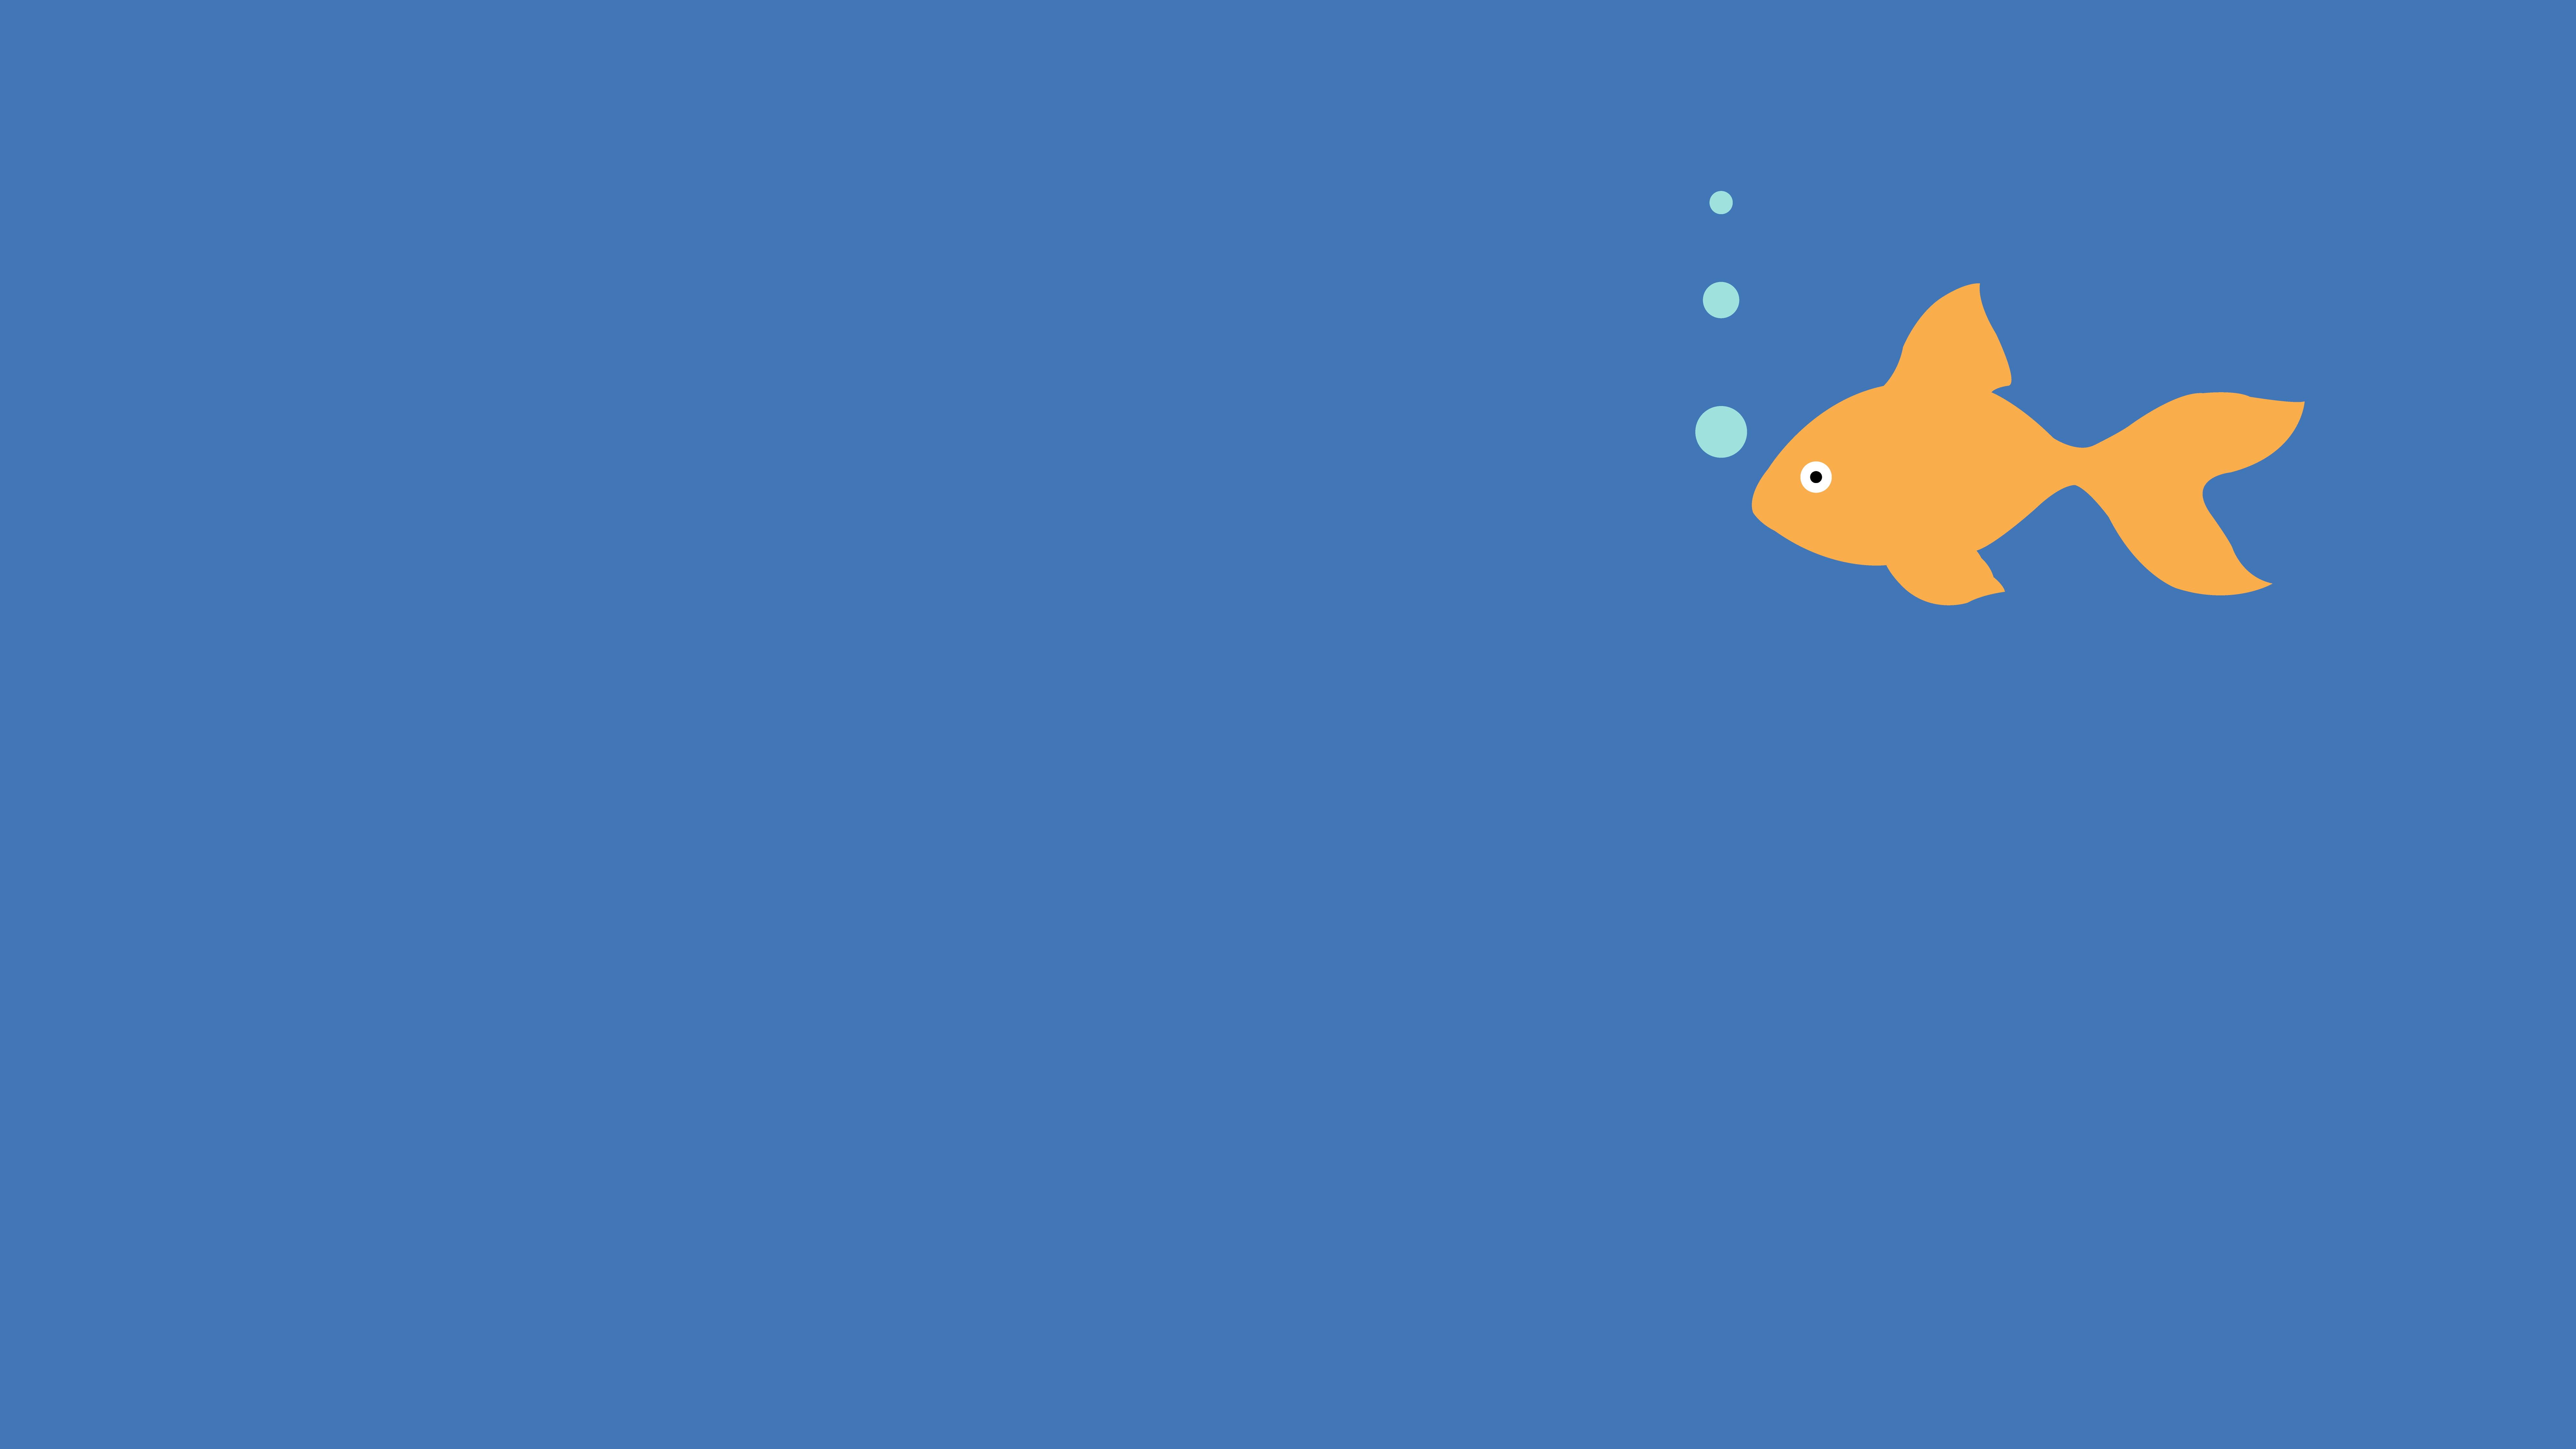 General 8000x4500 simple minimalism simple background Gold Fish Art